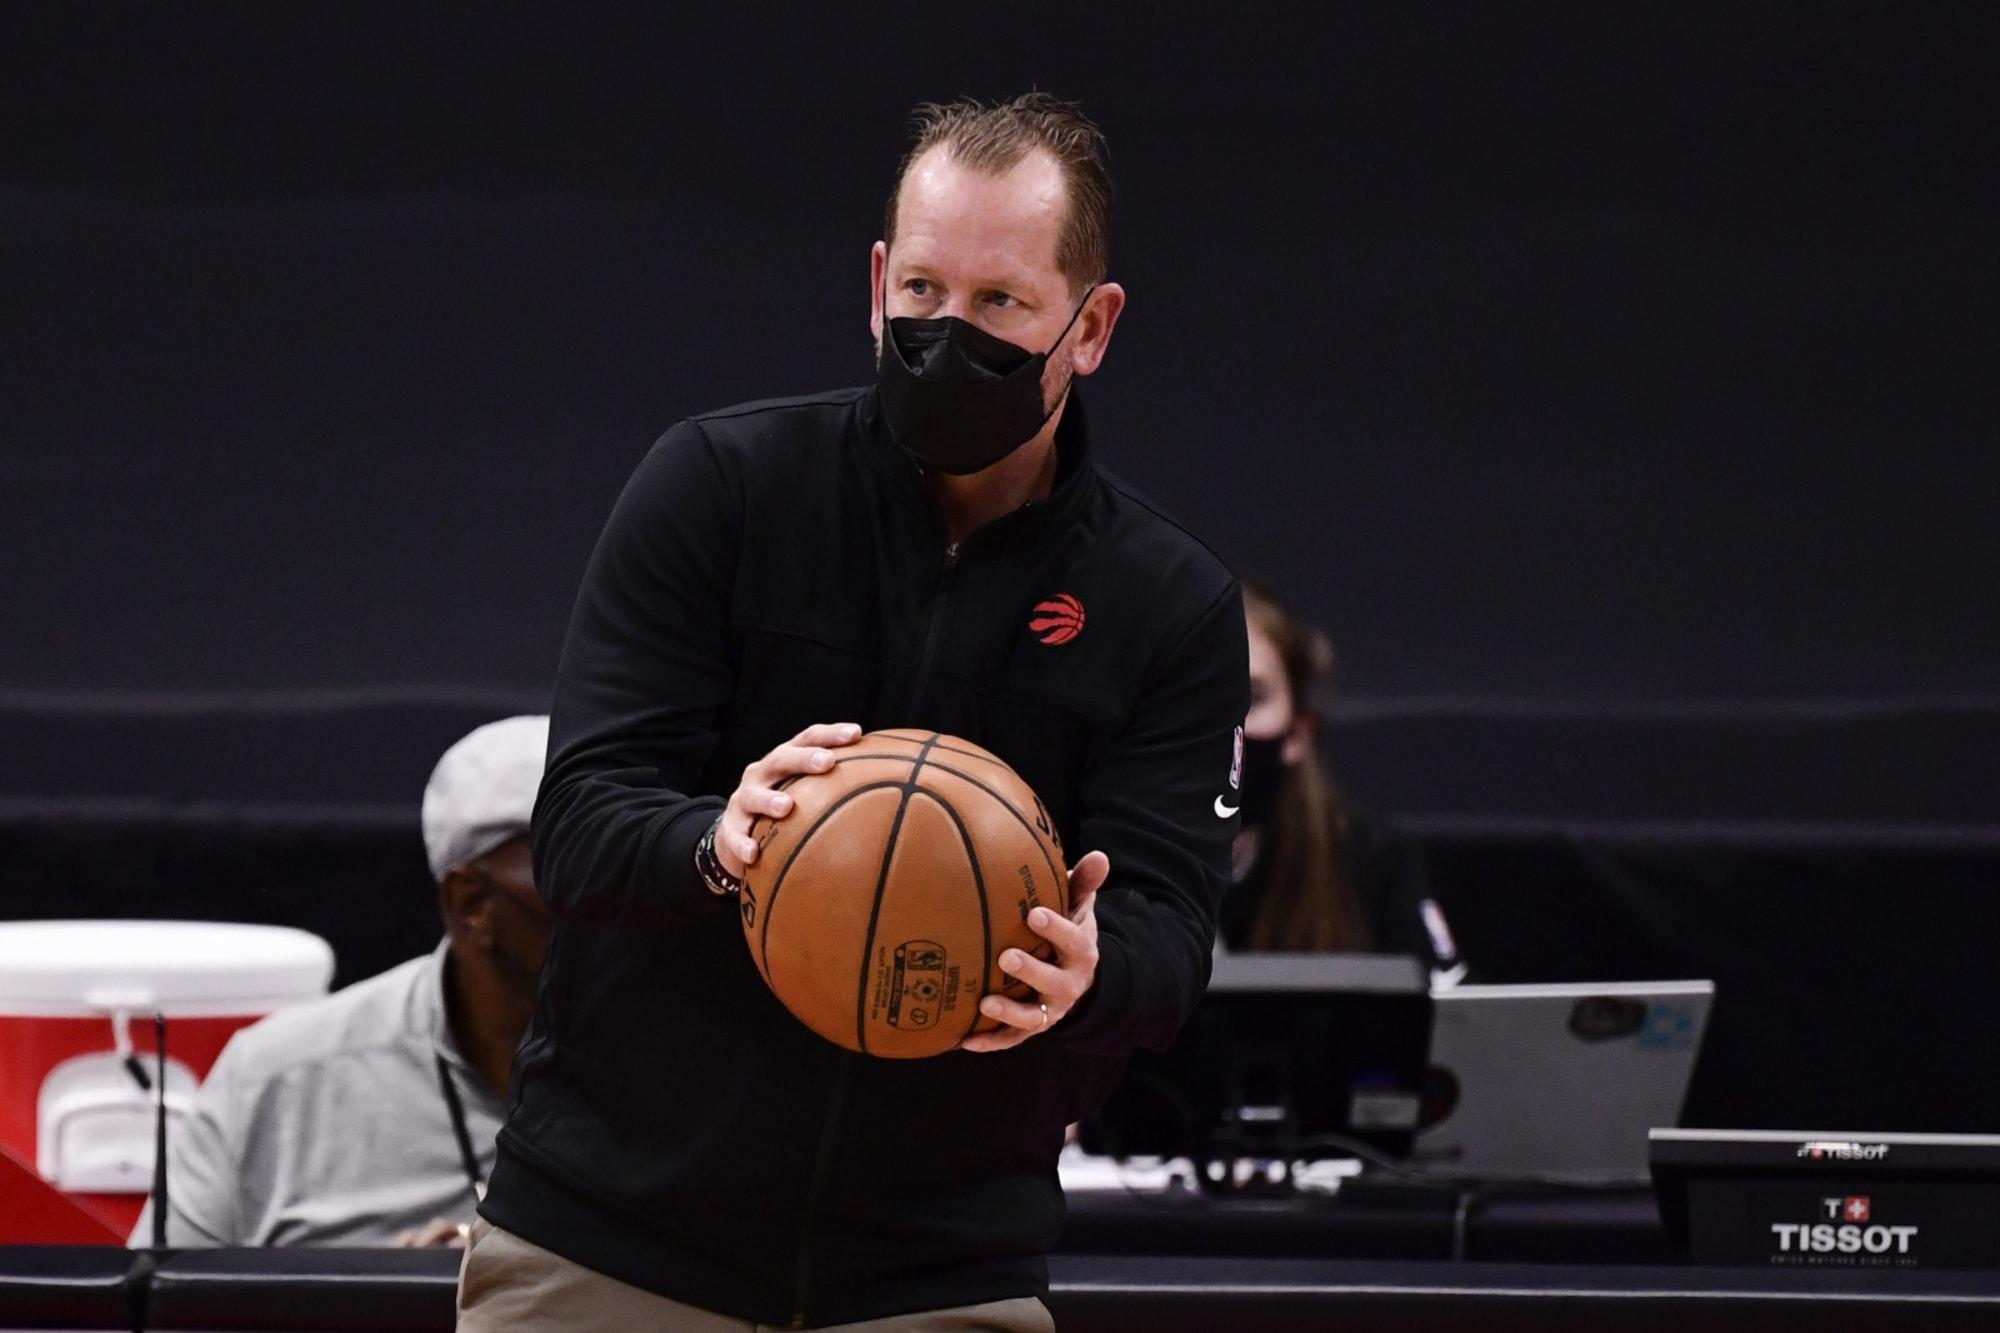 Toronto Raptors: Nick Nurse hints at being active in centers buyout market